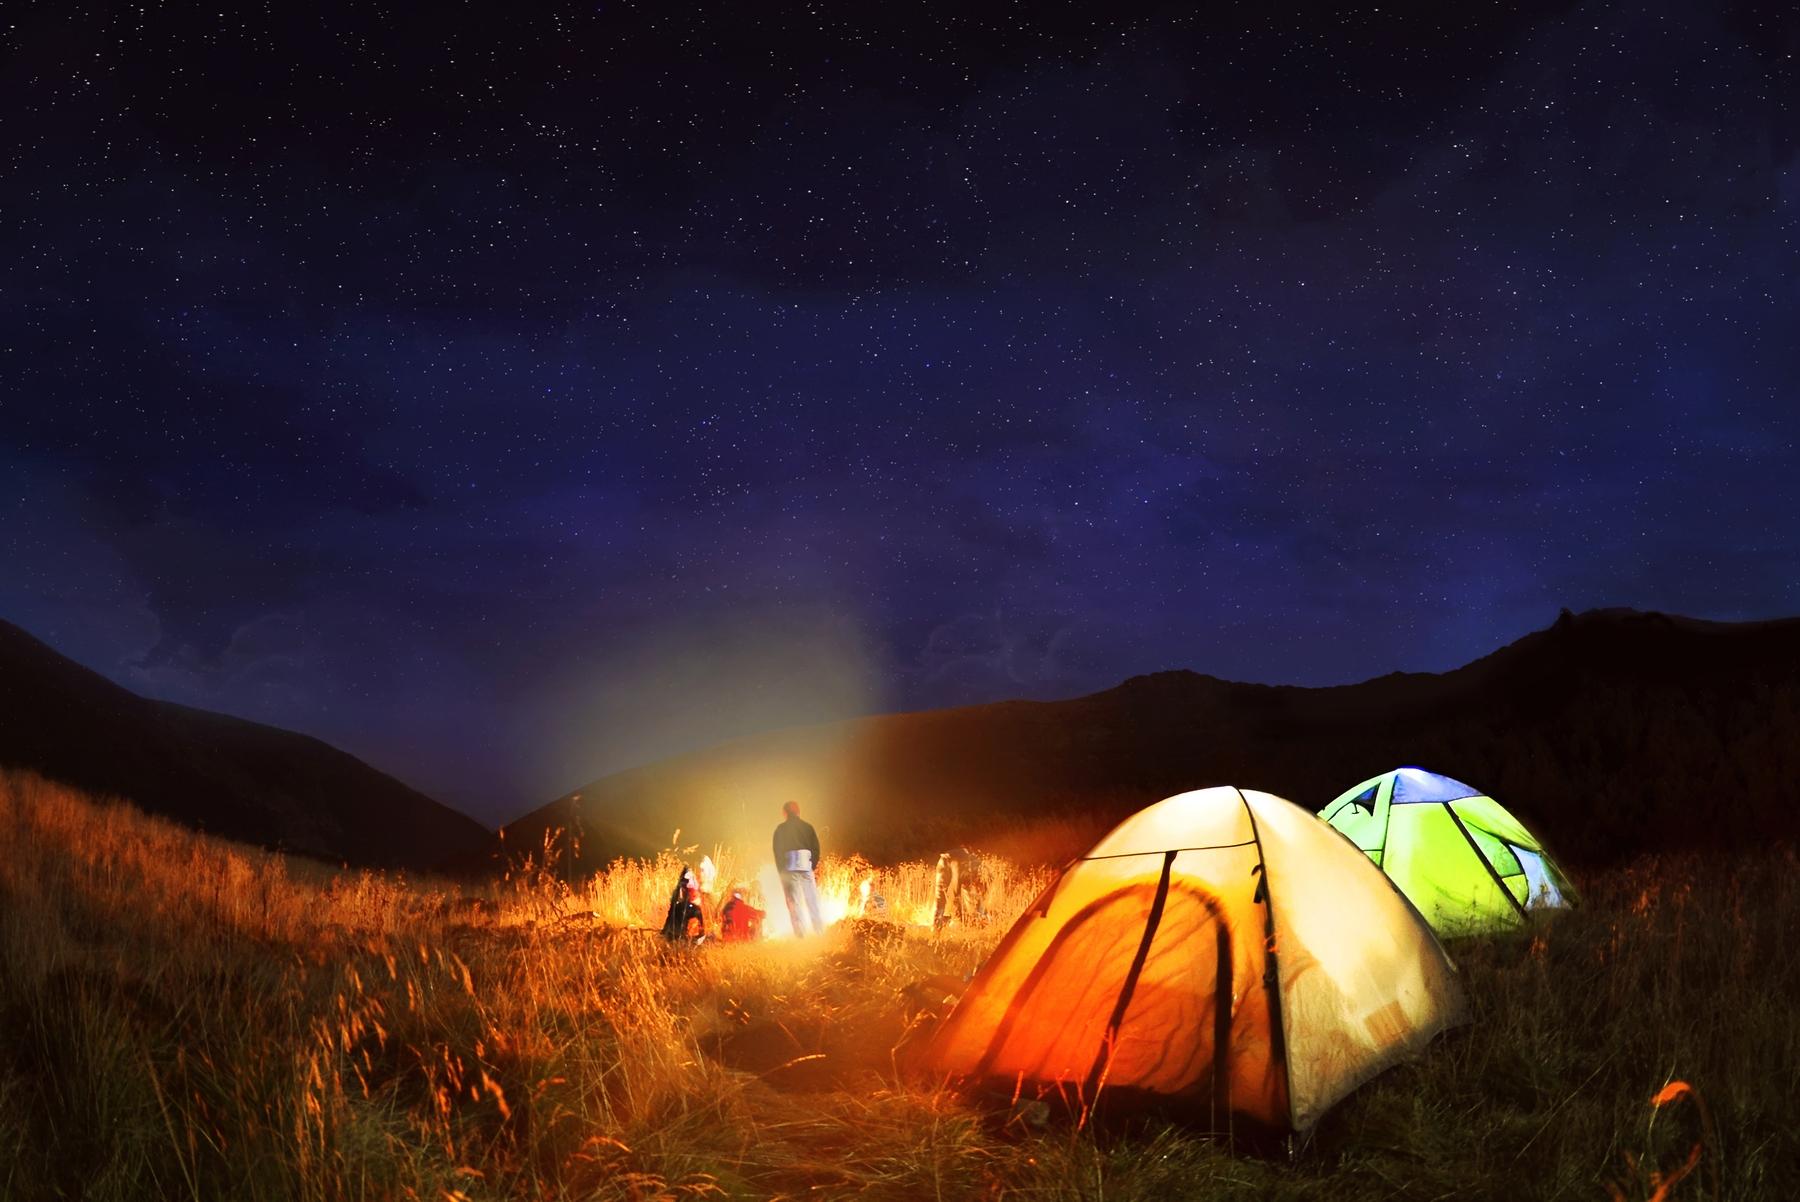 night camping and stargazing